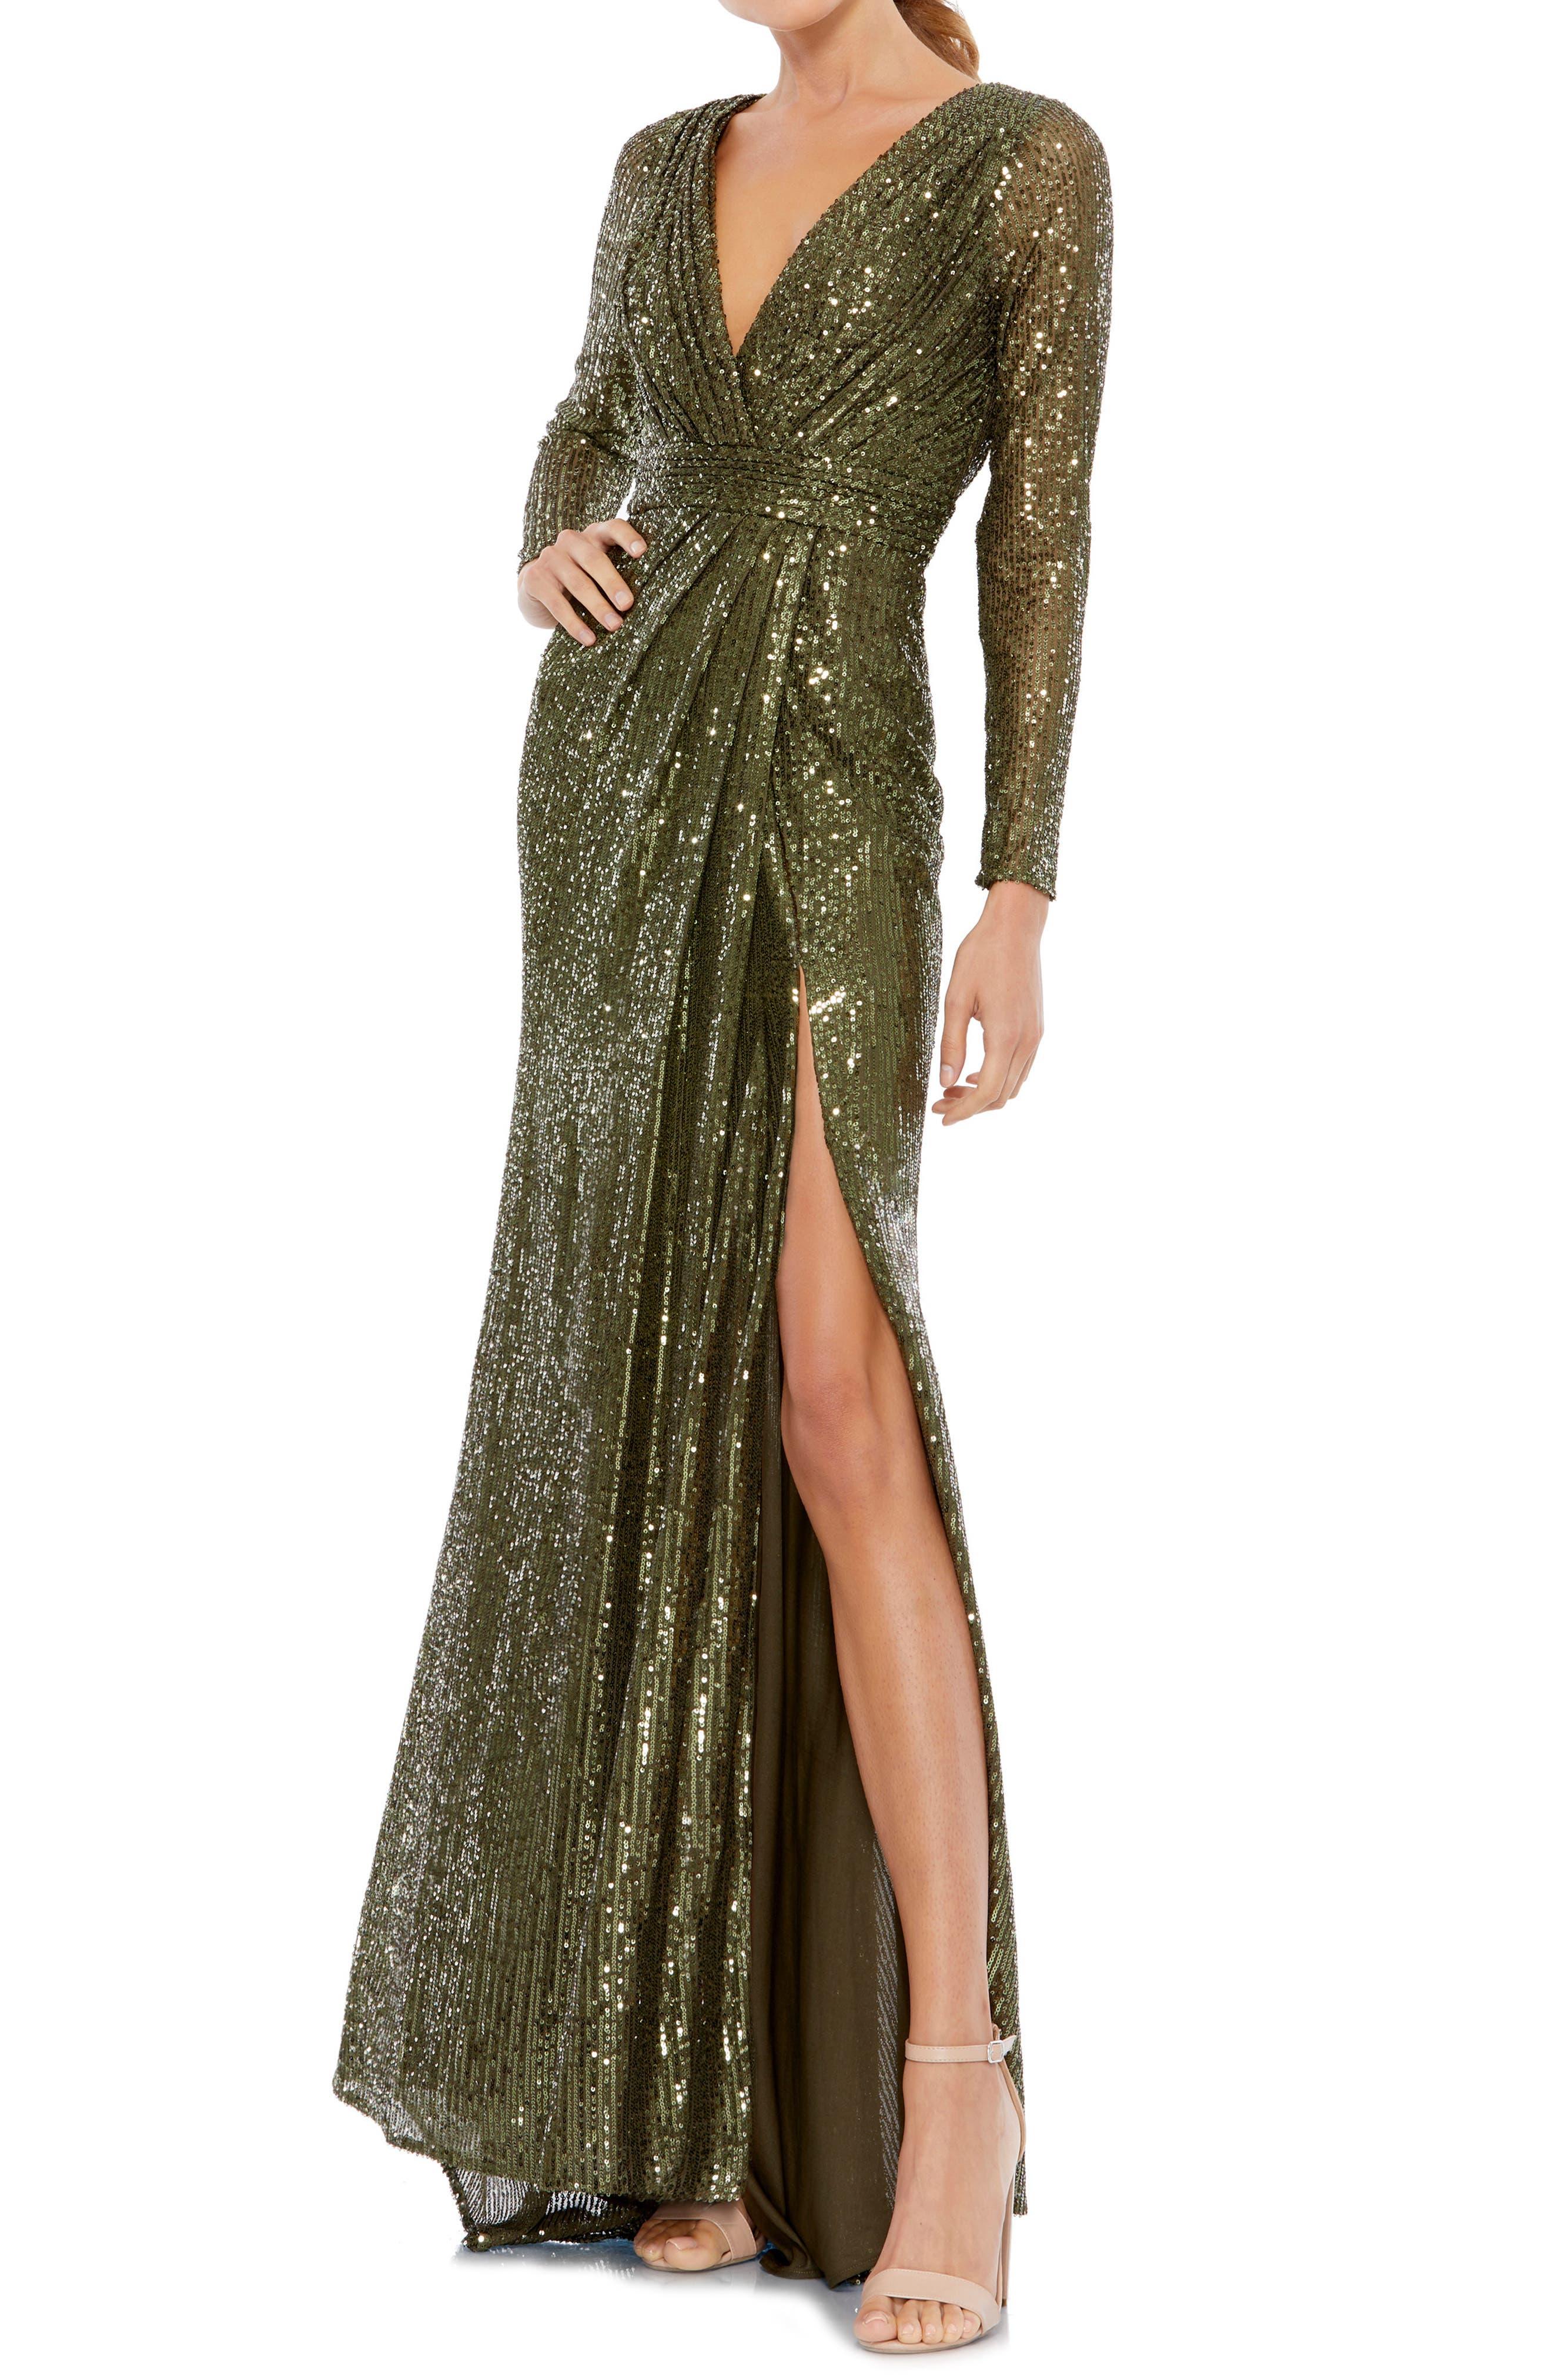 70s Dresses – Disco Dress, Hippie Dress, Wrap Dress Womens MAC Duggal Sequined Long Sleeve Gown Size 18 - Green $398.00 AT vintagedancer.com